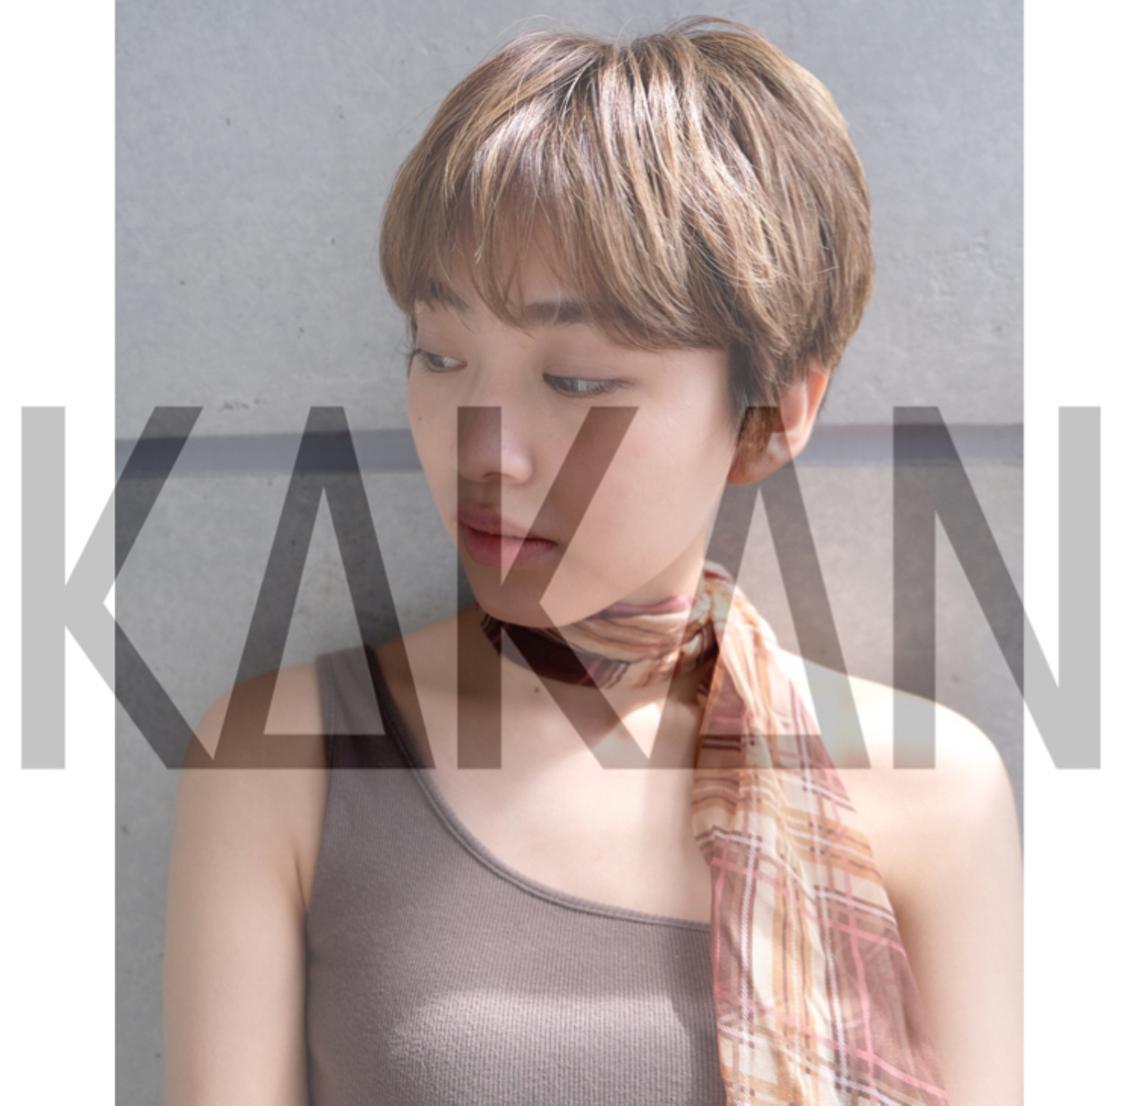 Kakan所属・佐藤佳奈の掲載